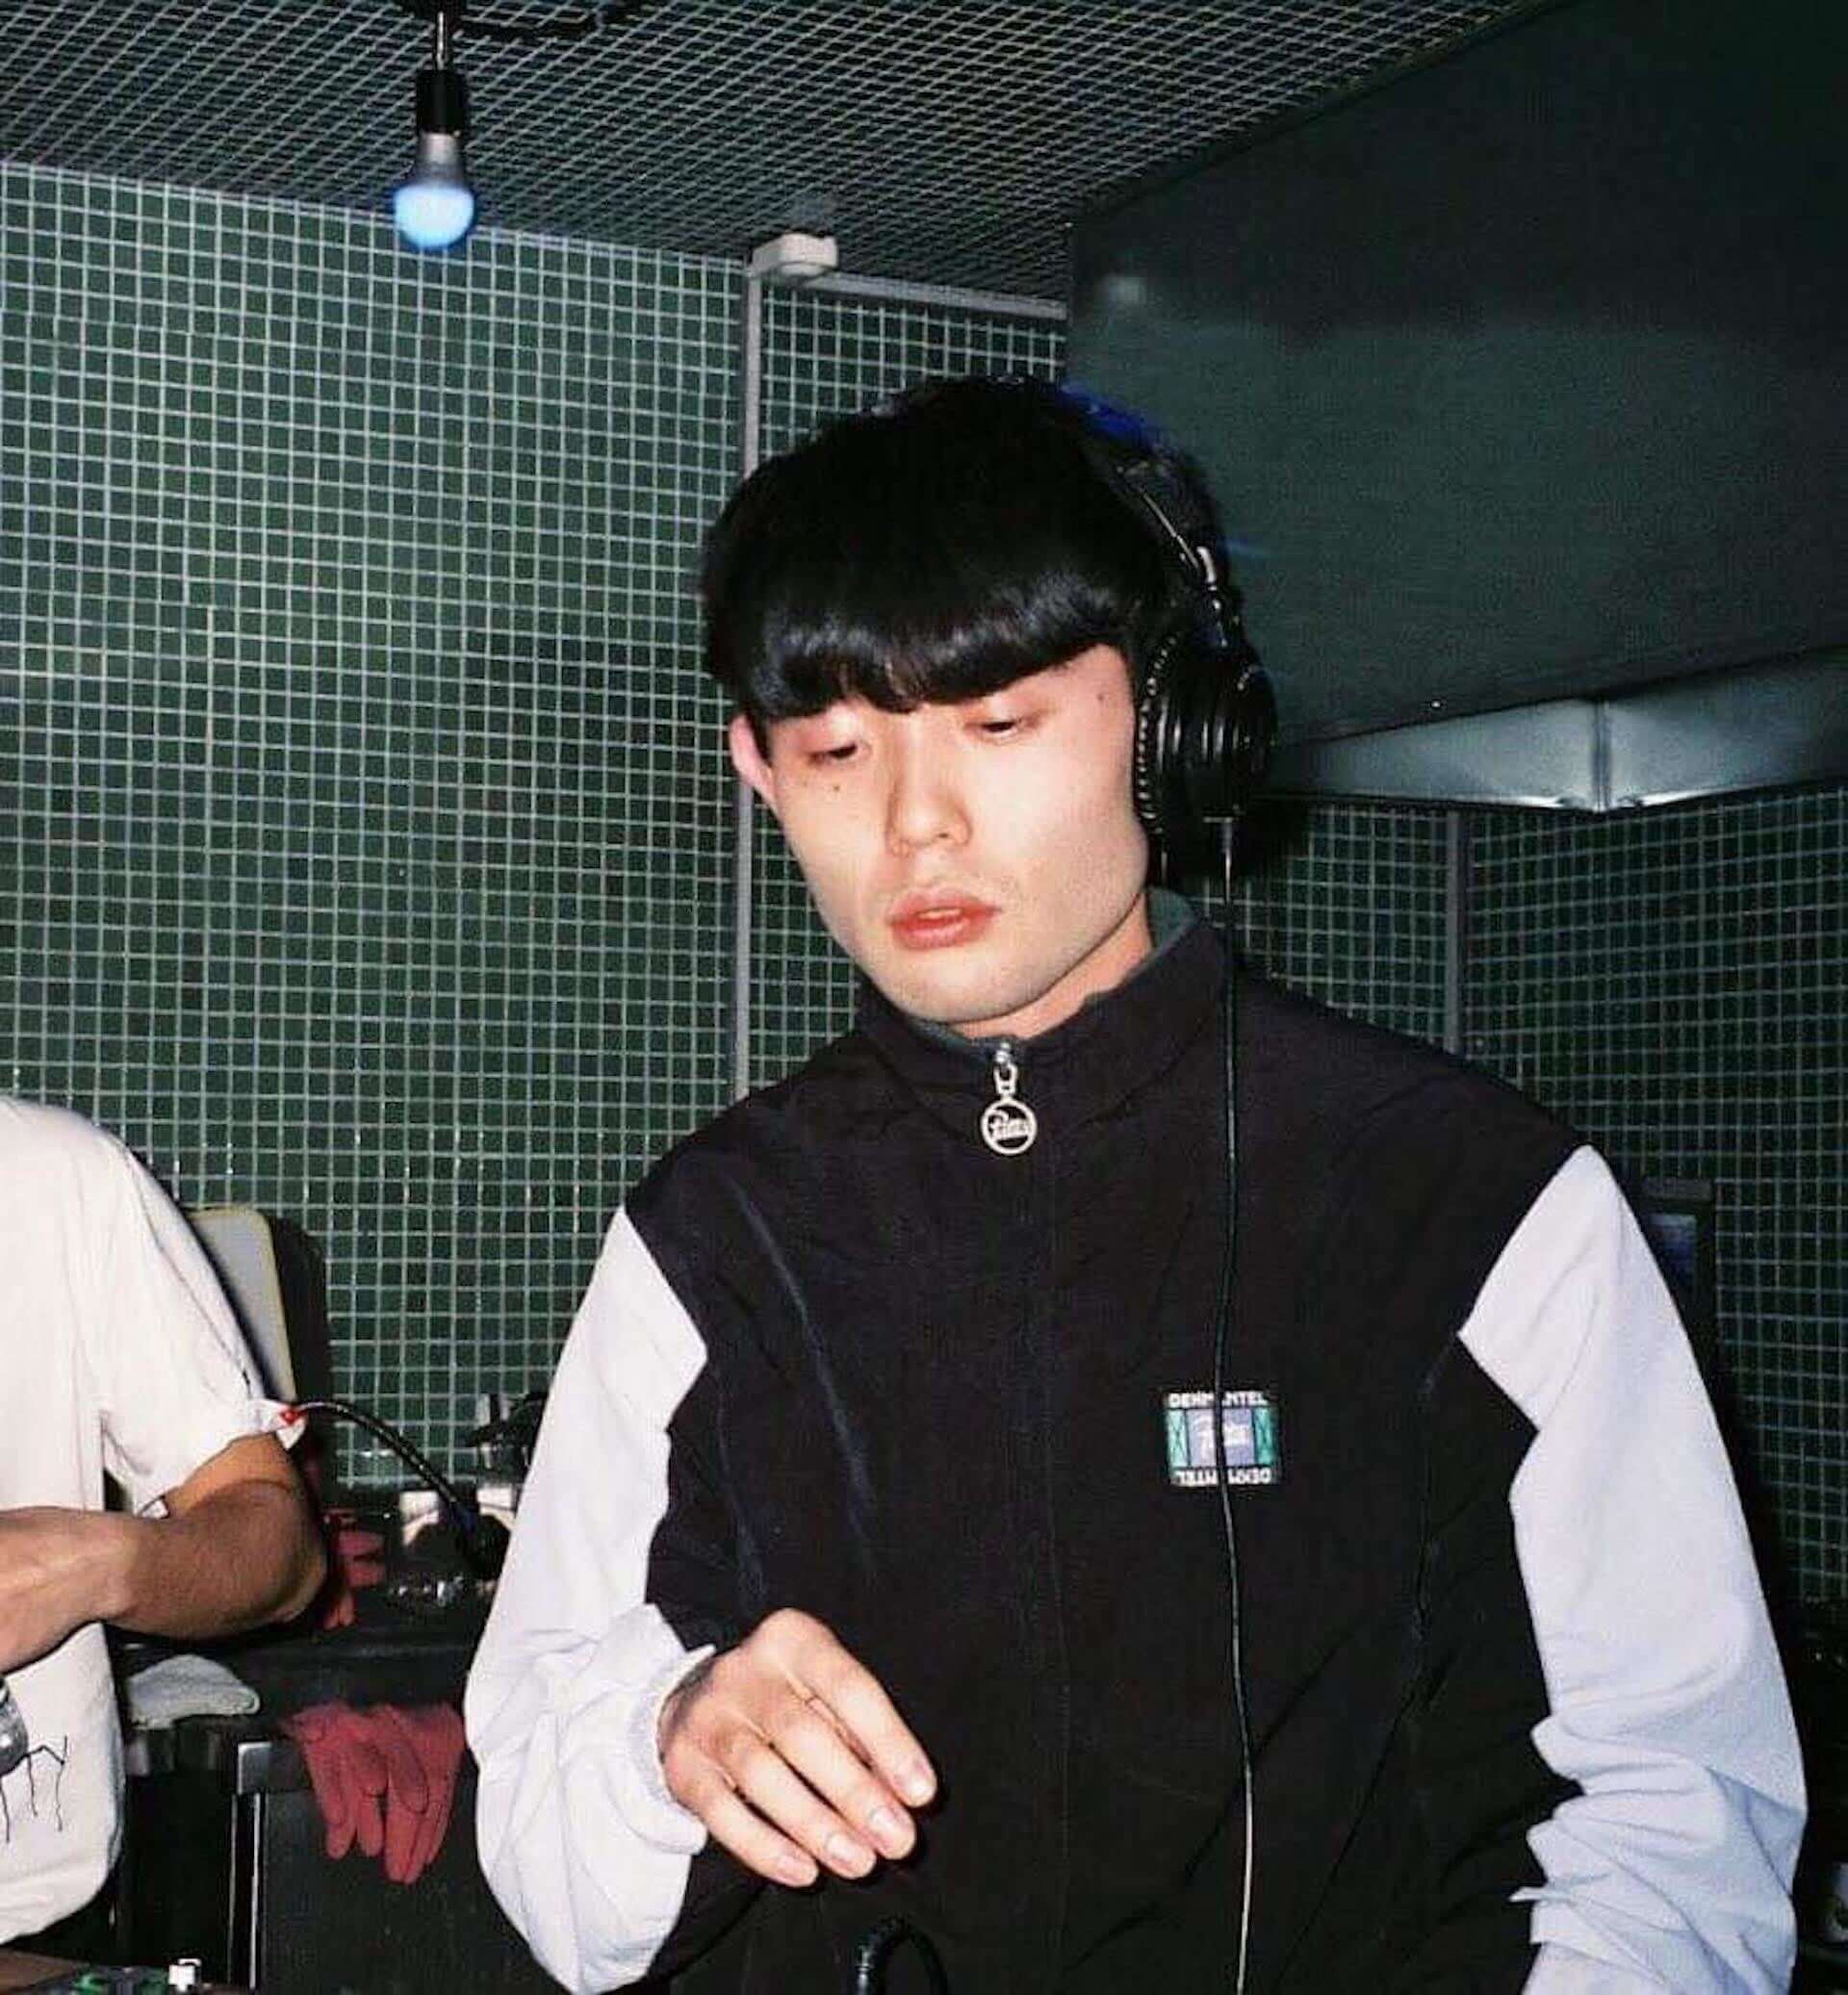 Moment Tokyo主催デジタルフェス<331VILLAGE>の第1弾ラインナップが発表|TAAR、Kotsu、Kamui、Yohji Igarashiなど music200525_311village_lineup_6-1920x2073